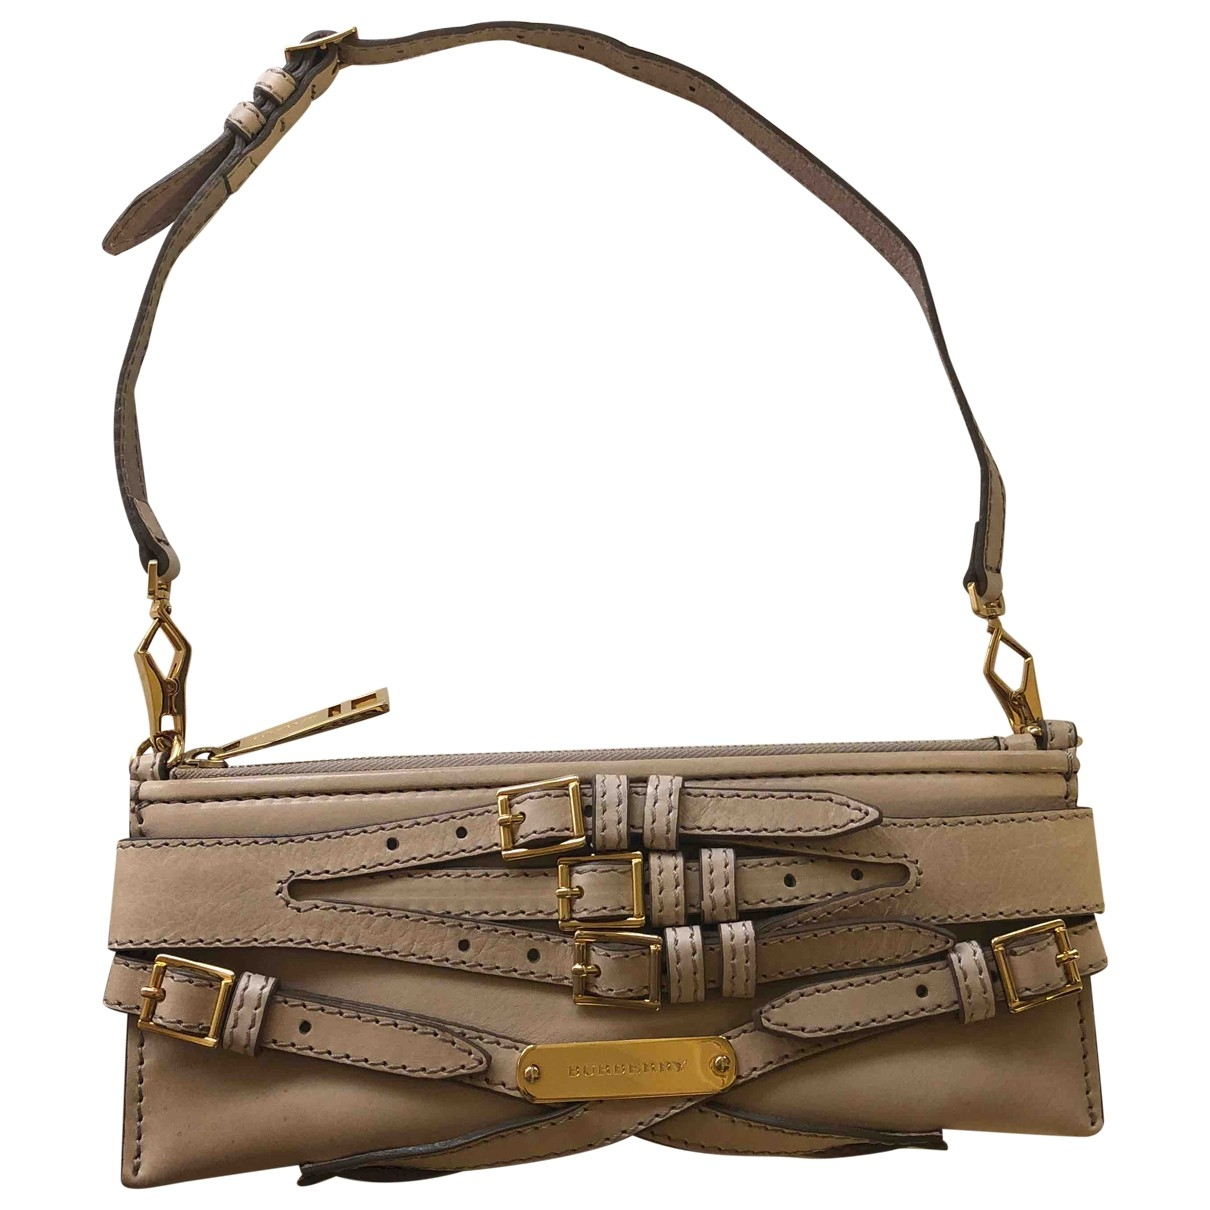 Burberry \N Beige Leather Clutch bag for Women \N